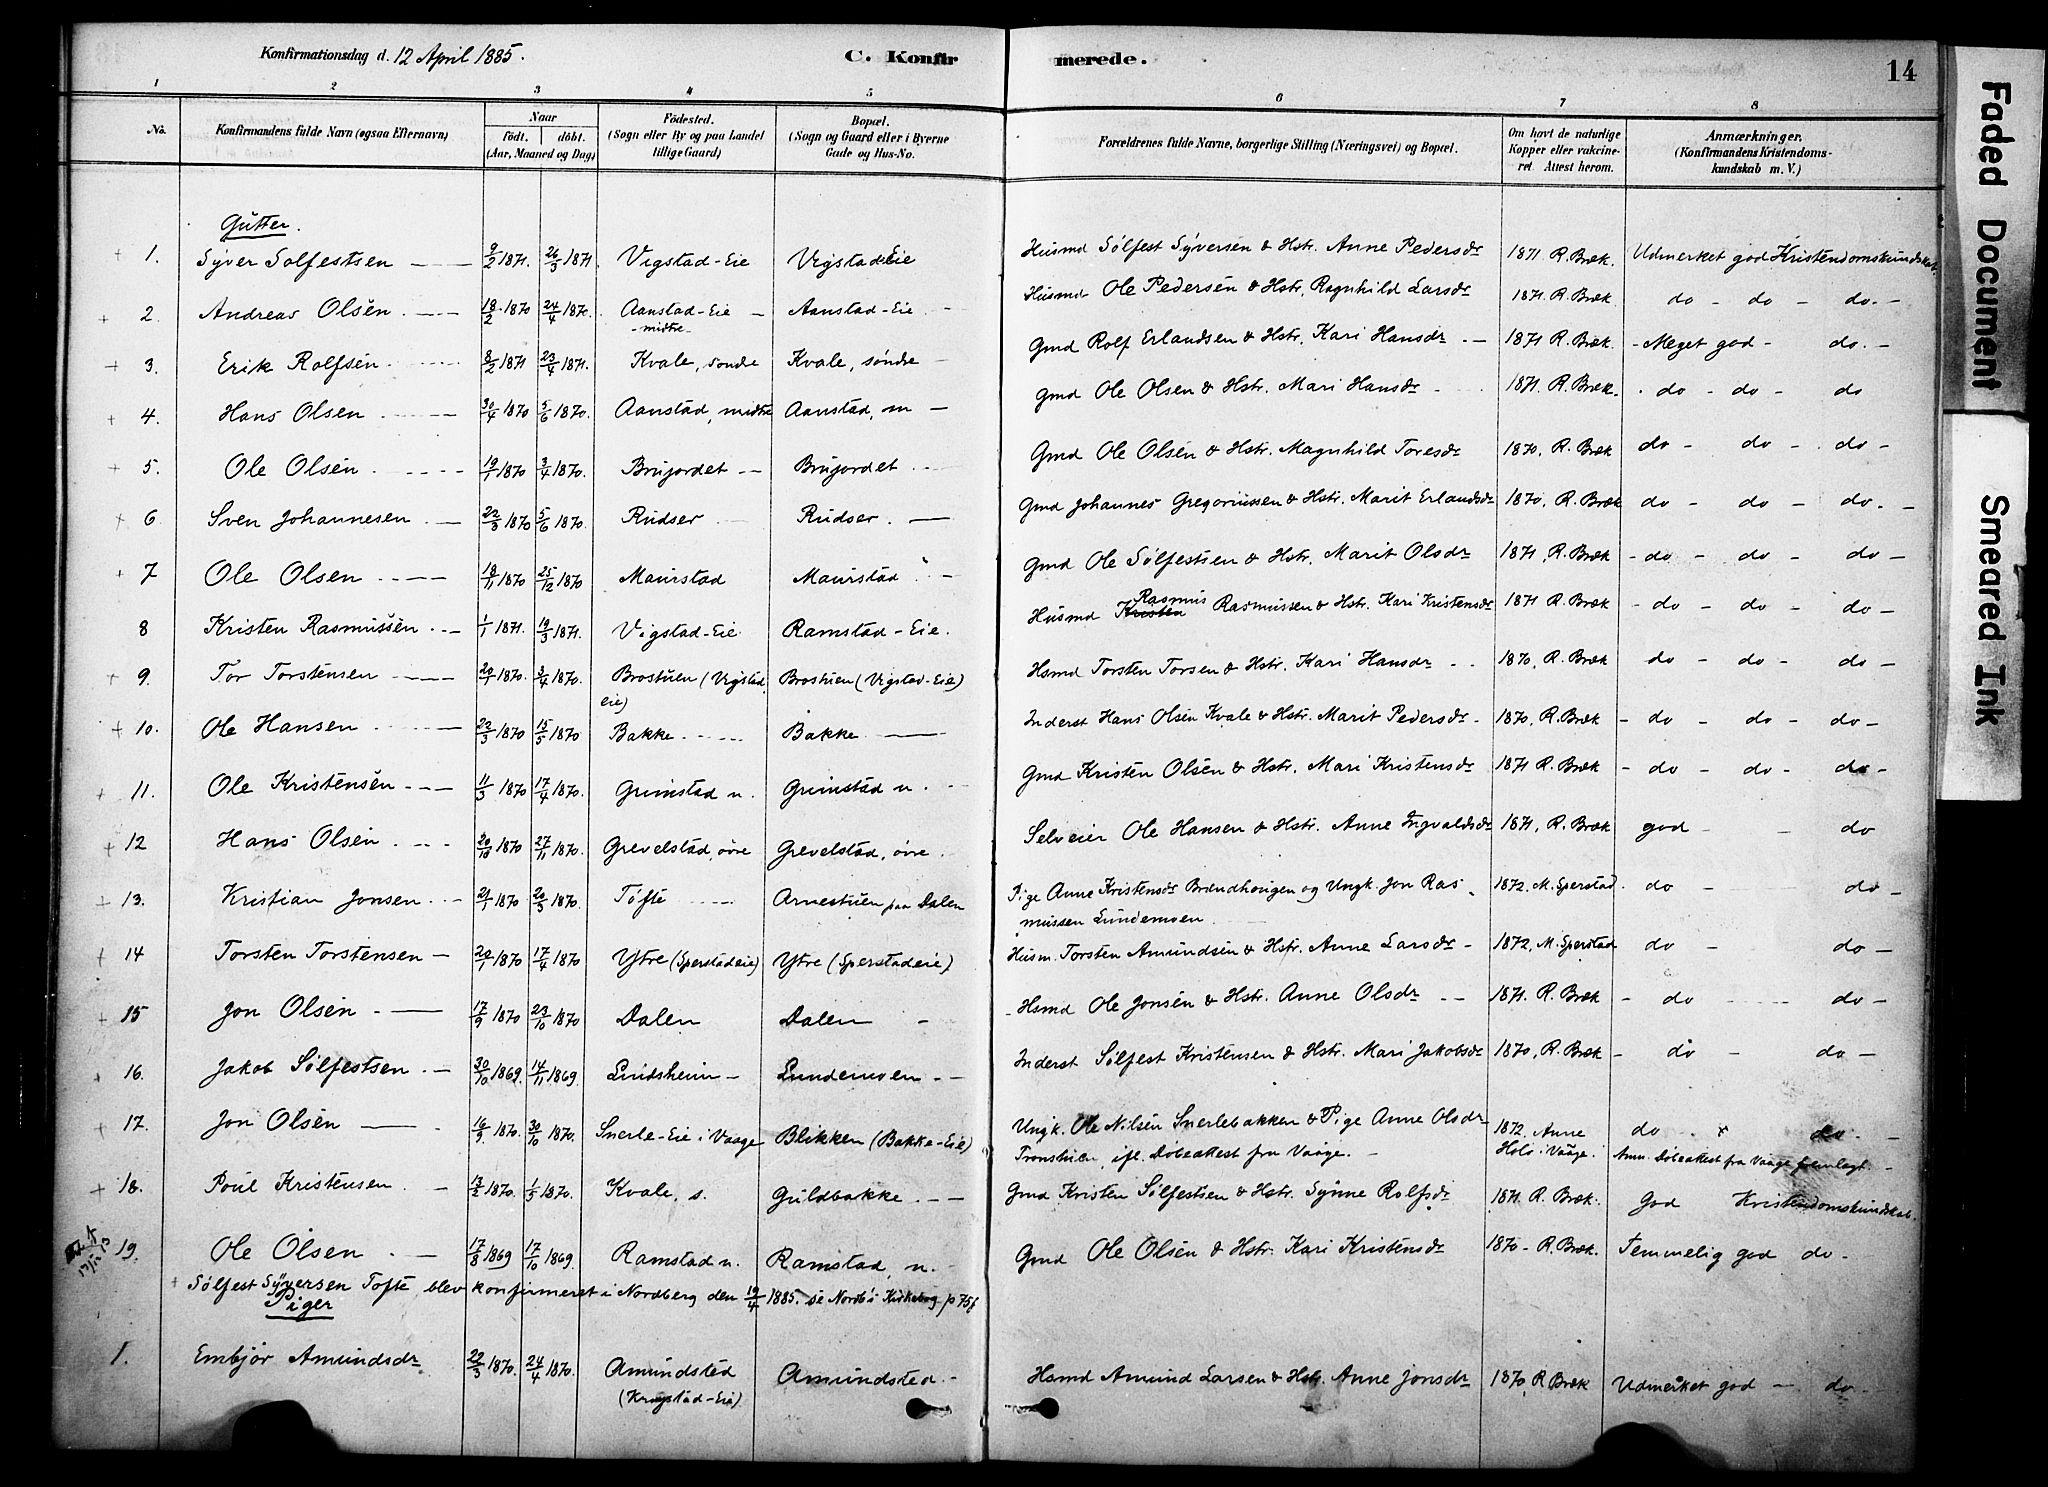 SAH, Skjåk prestekontor, Ministerialbok nr. 2, 1878-1907, s. 14